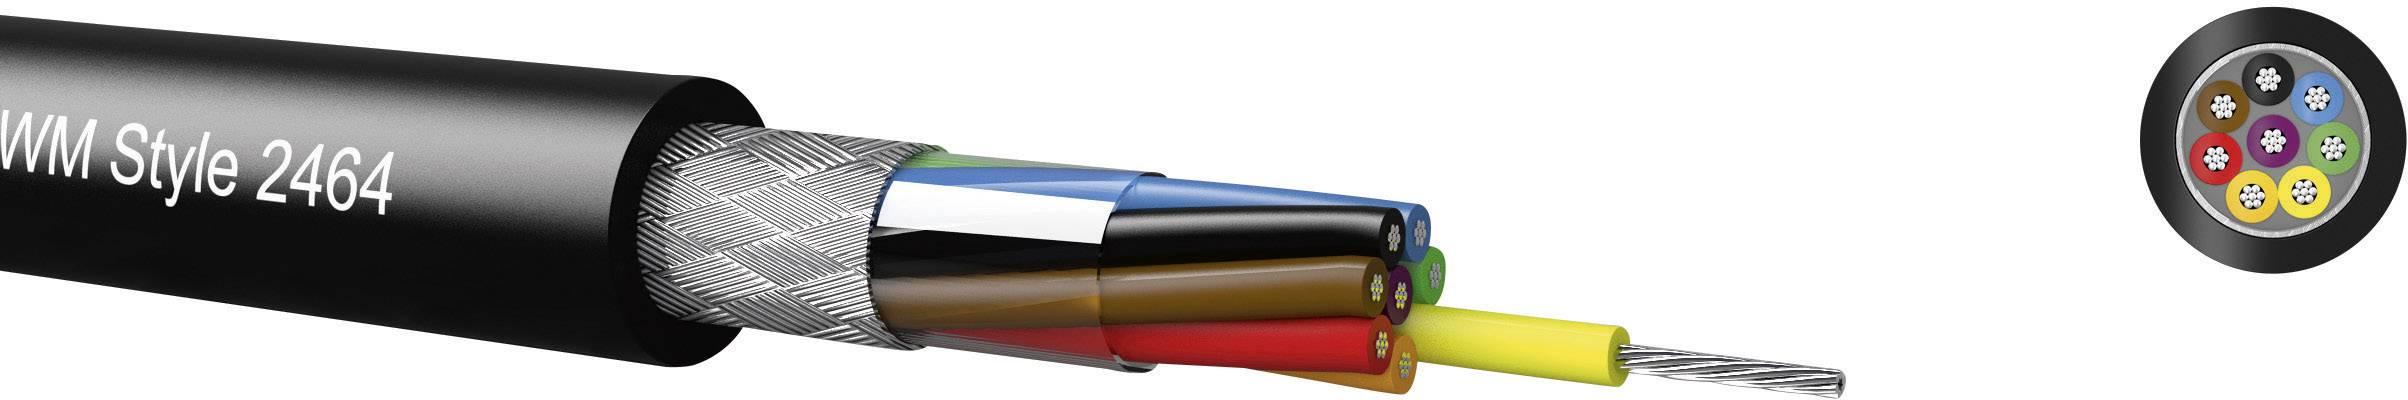 Riadiaci kábel Kabeltronik LiYCY 96162409, 16 x 0.22 mm², vonkajší Ø 7.80 mm, 300 V, metrový tovar, čierna